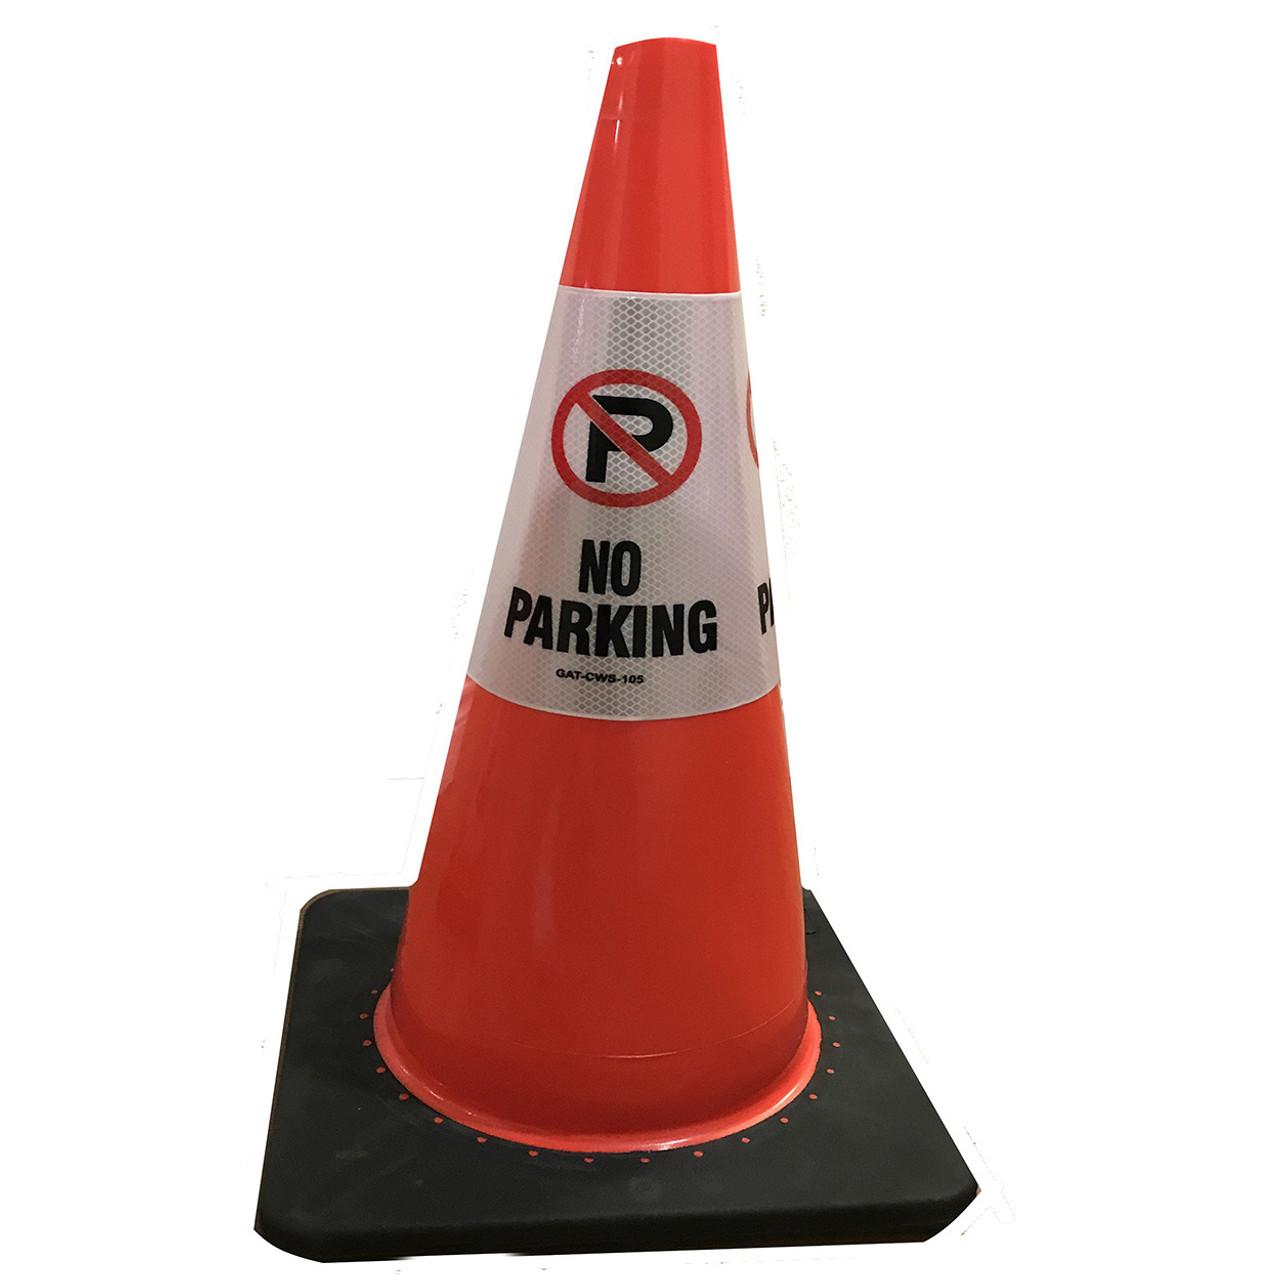 No parking Safety Cone Collar - Reflective-3